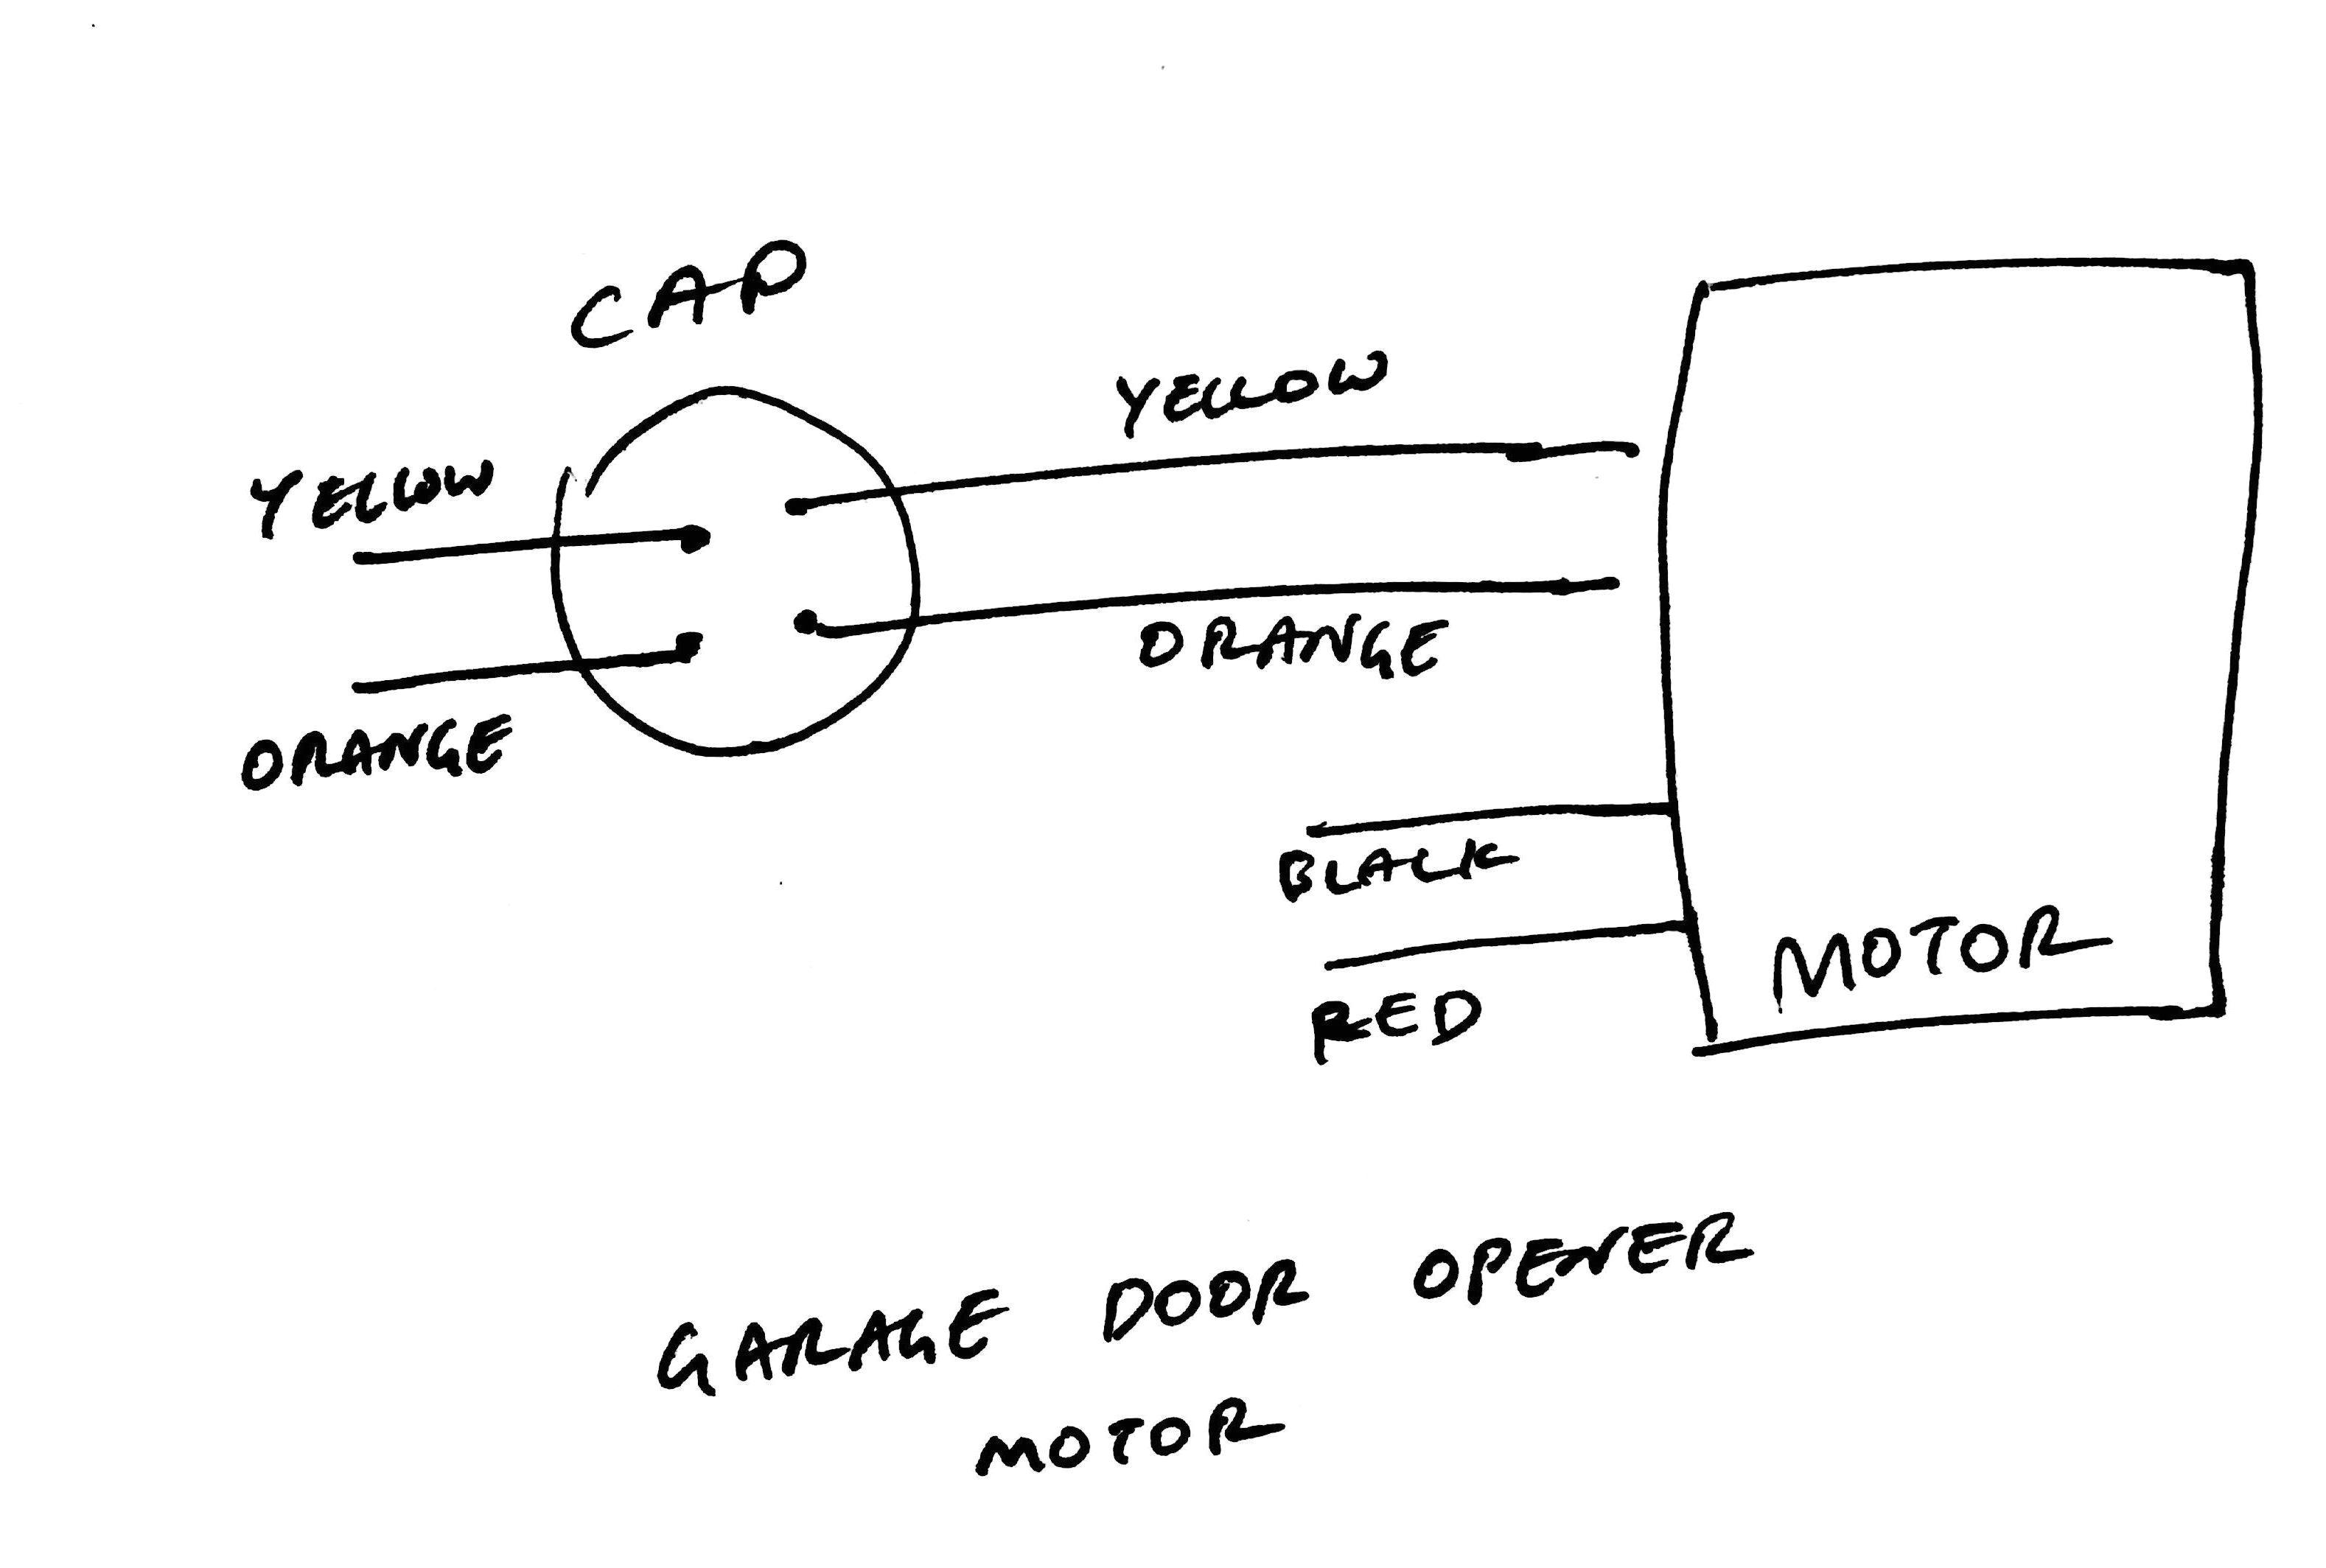 motor wiring diagram 4 wire wiring diagram fascinating dc motor wiring diagram 4 wire dc motor wiring diagram 4 wire